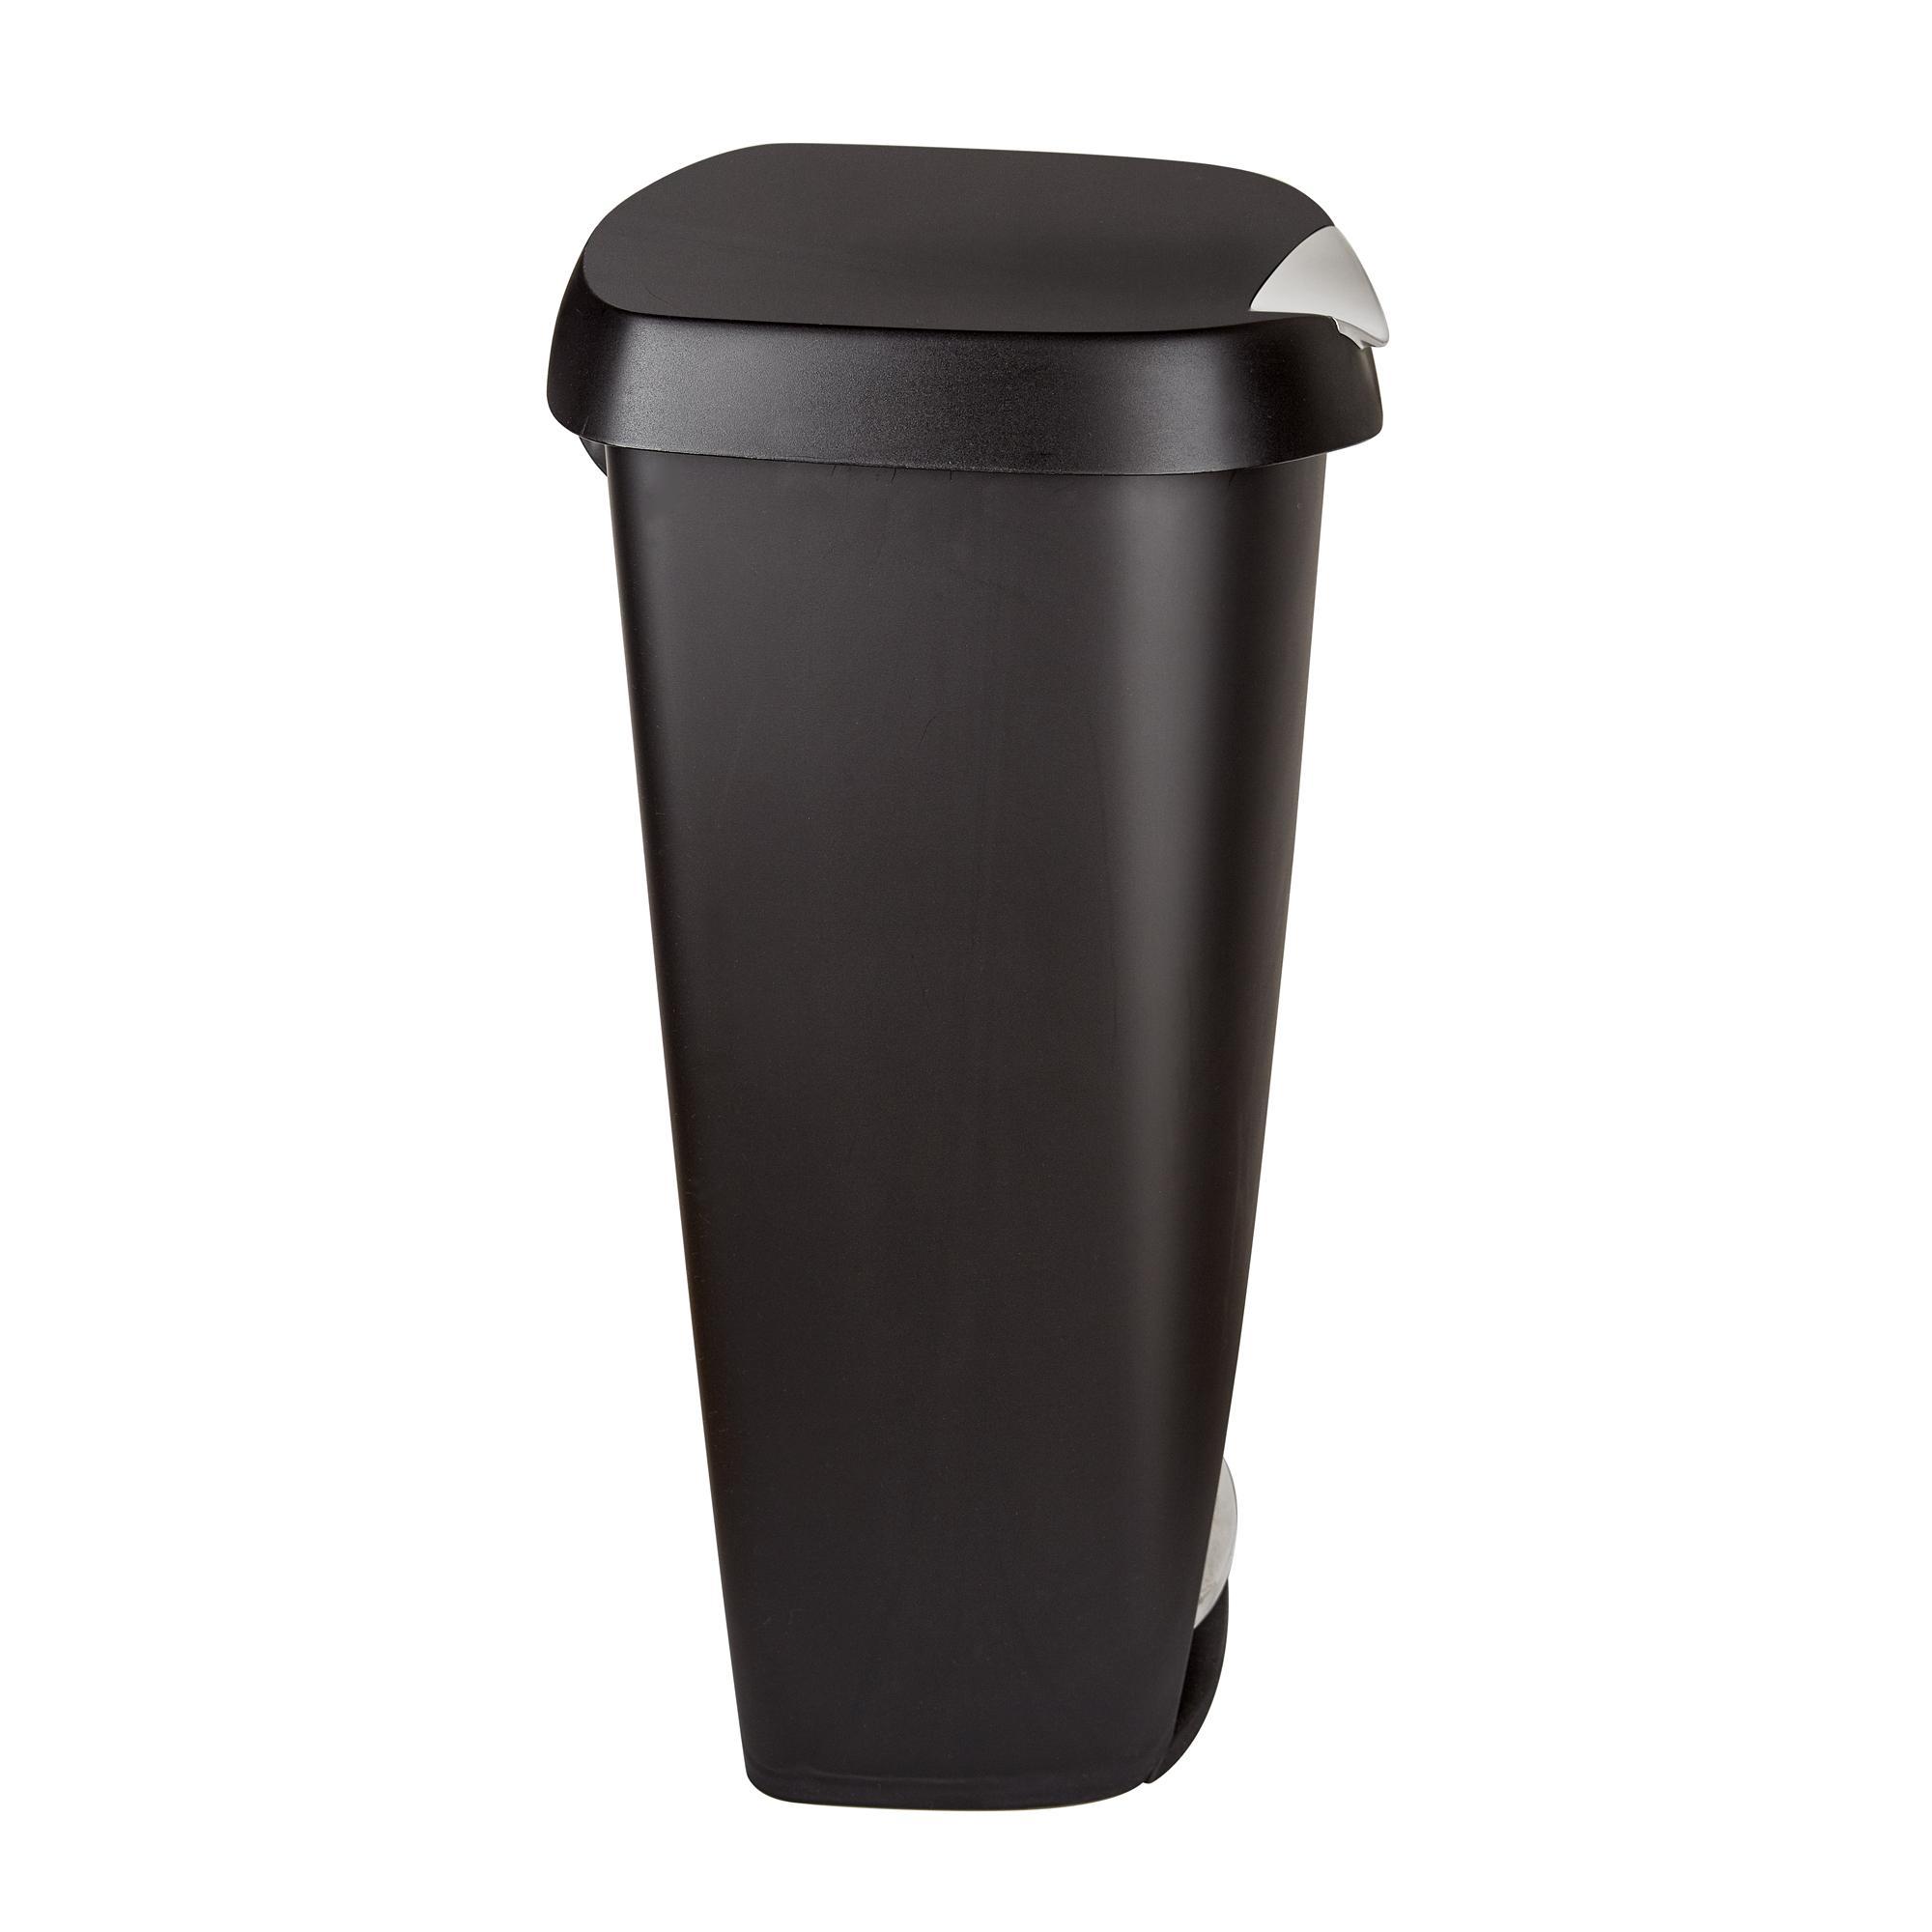 Amazon.com: Umbra 084200-047 Brim Large Kitchen Trash Can ...